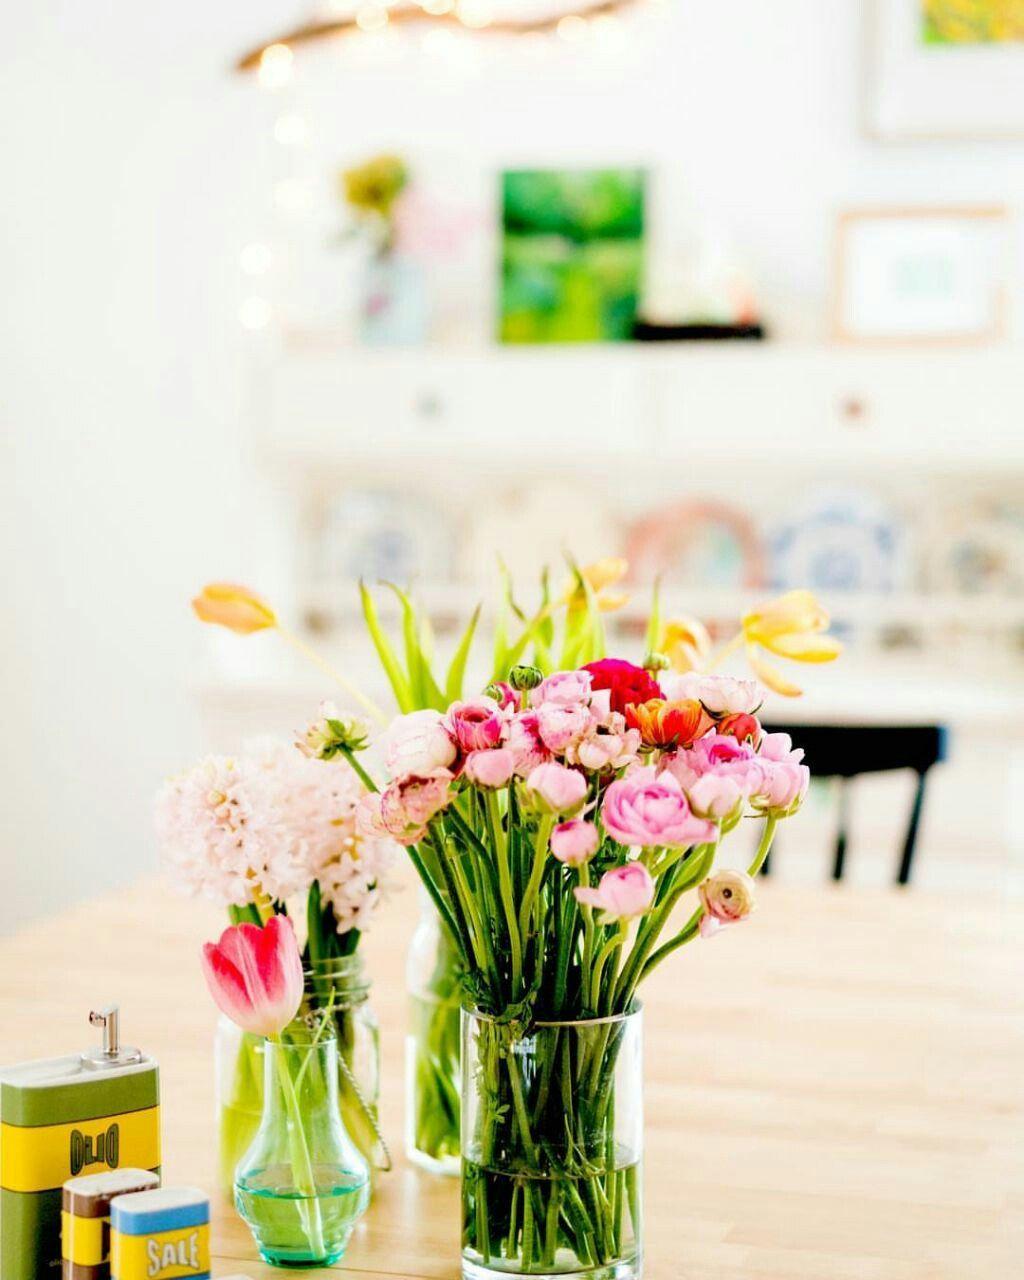 Pin by Ghada Moustafa on Flowers Jewelry design, Flowers